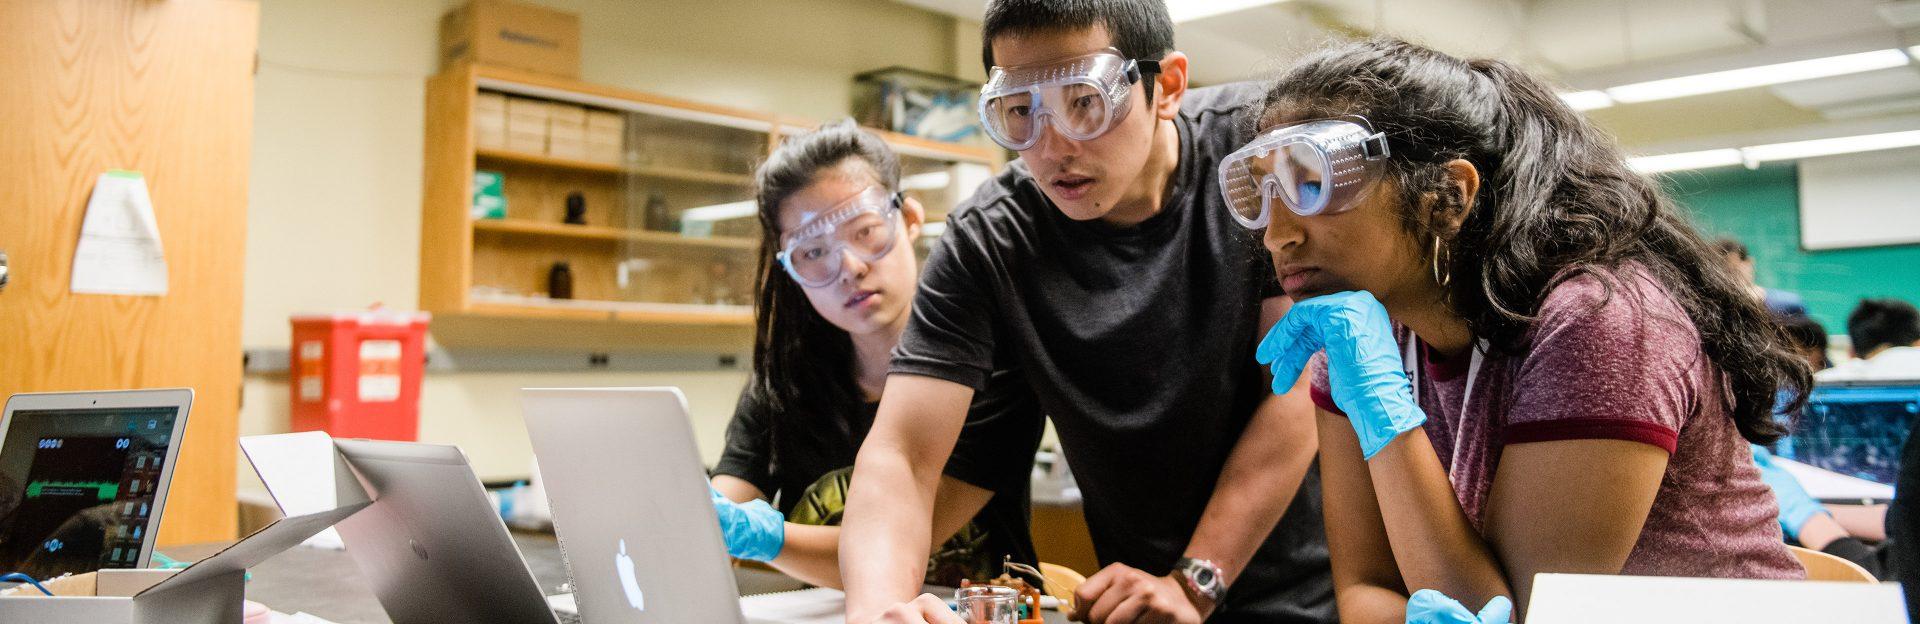 Boston University: STEM Programs